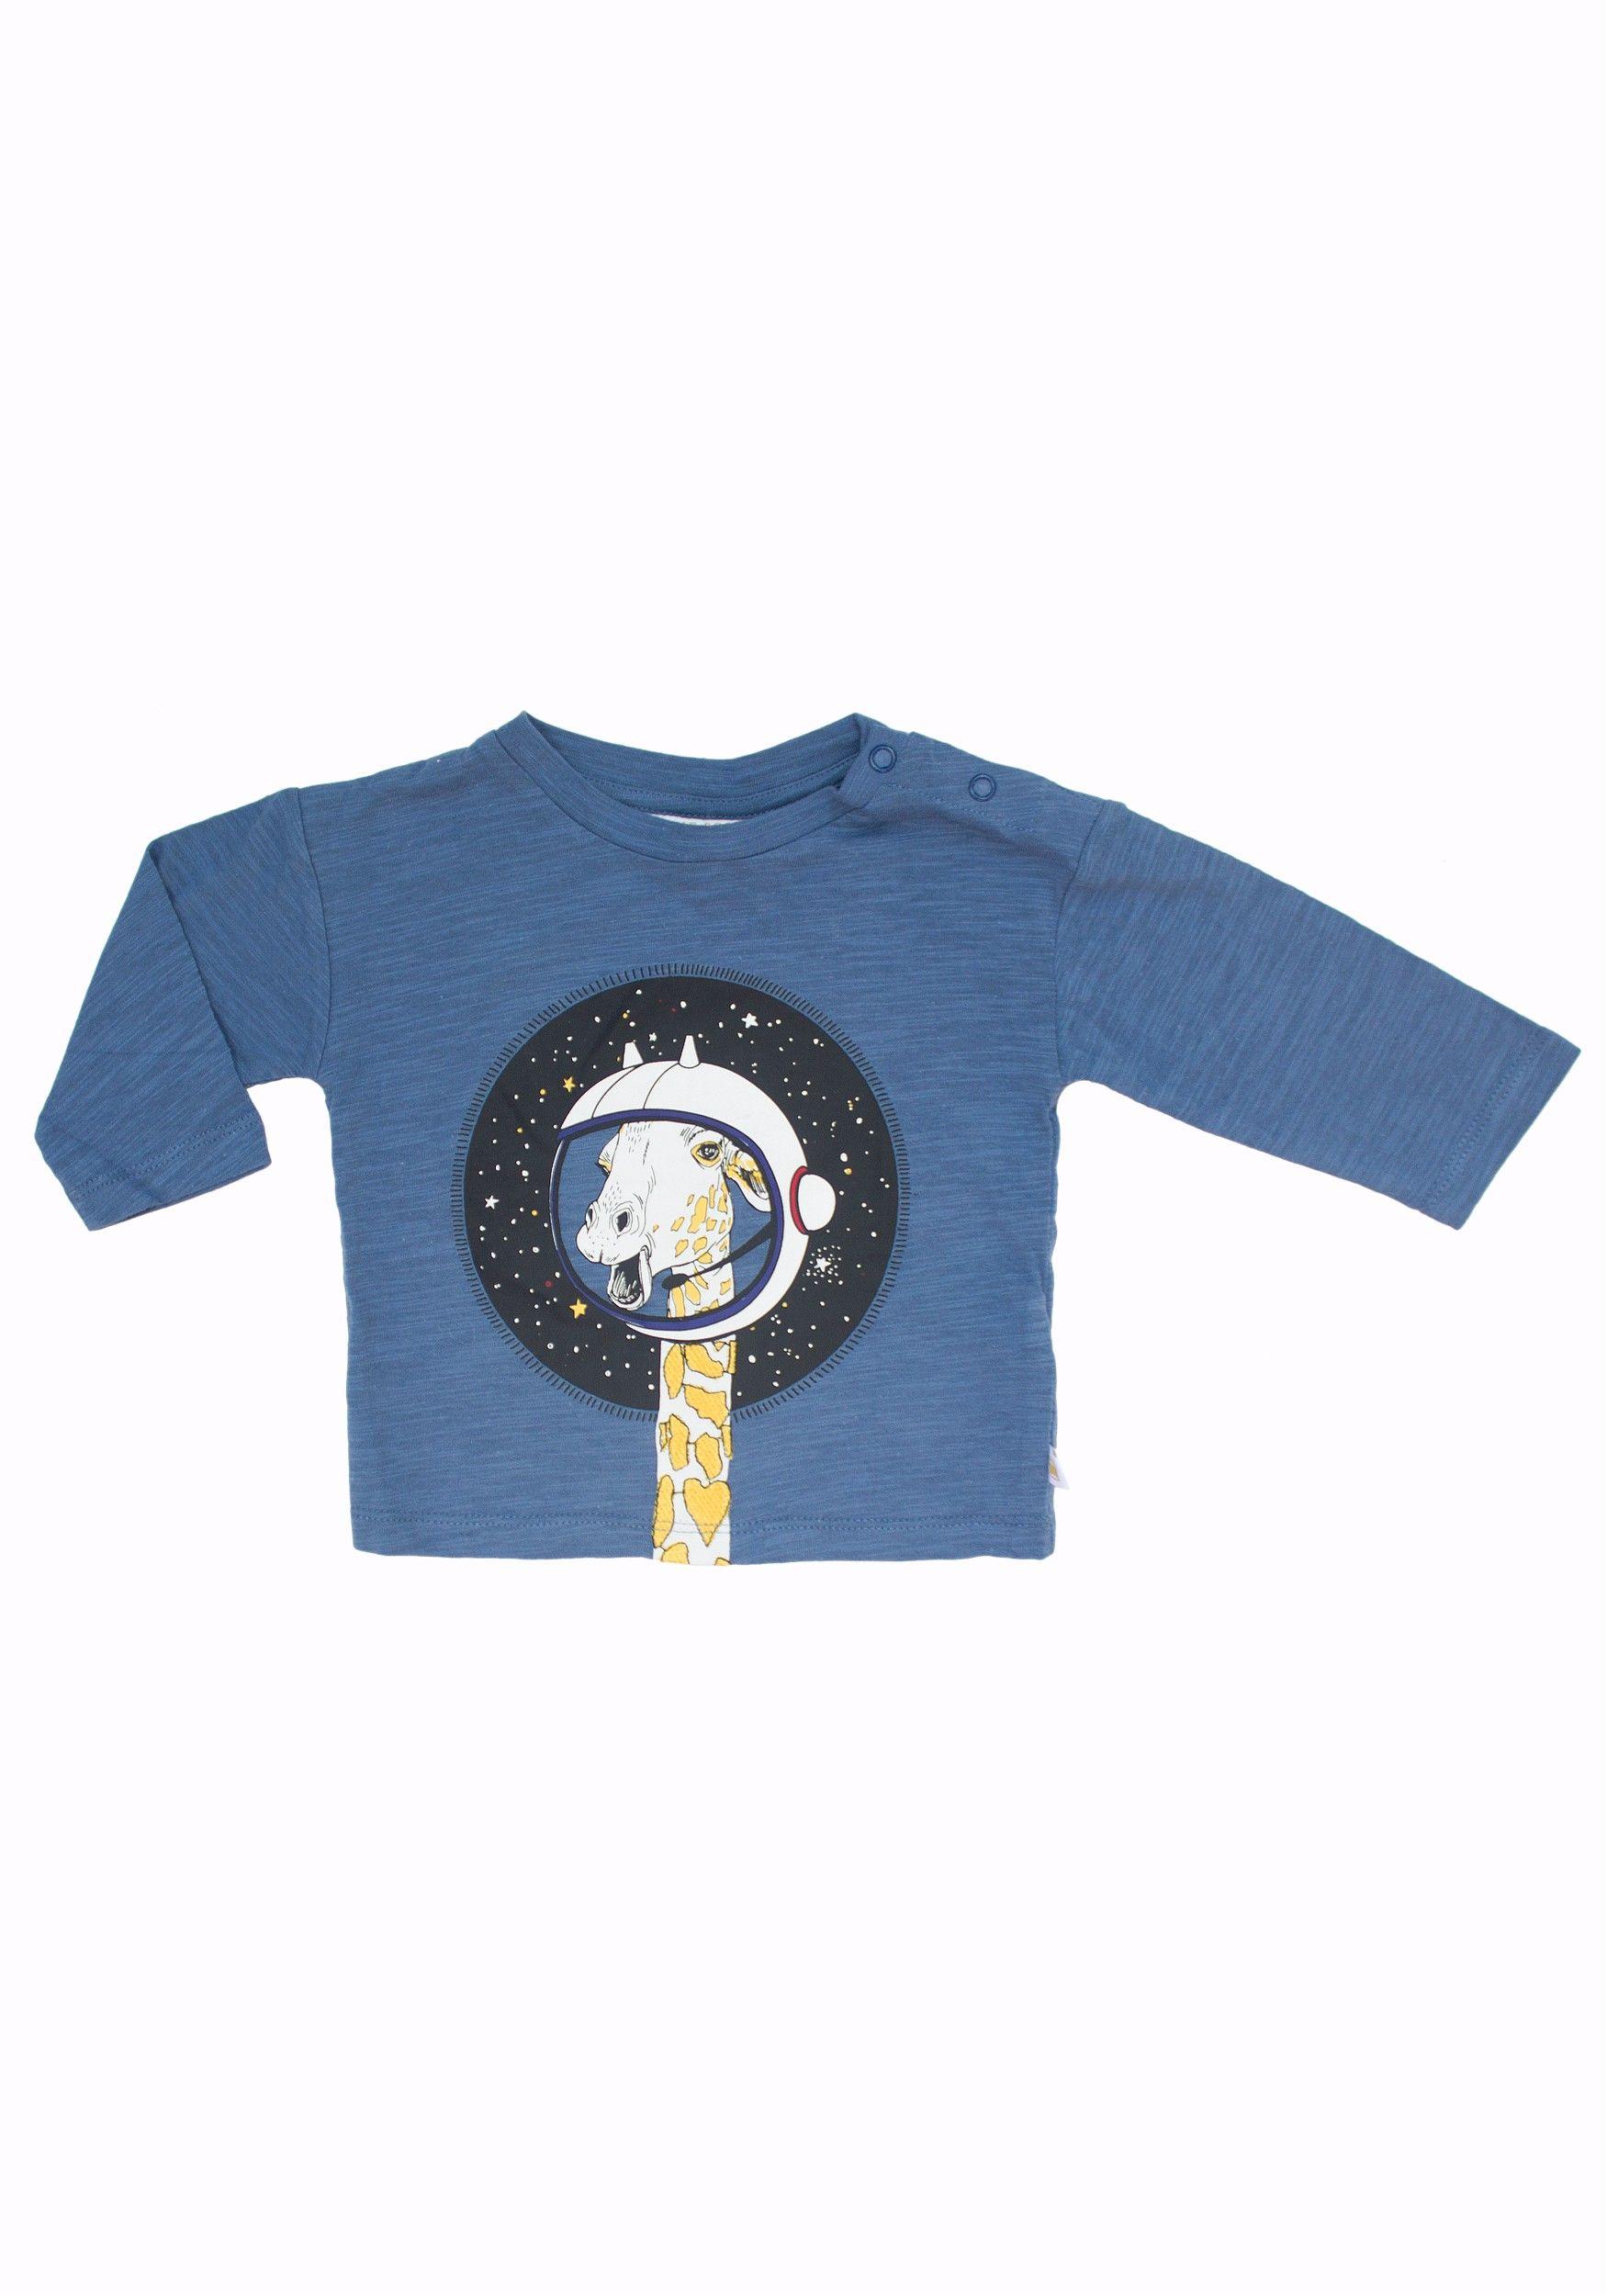 d9baf6732 Giraffe In Space Tee by Rosie Pope | Products | Giraffe shirt ...